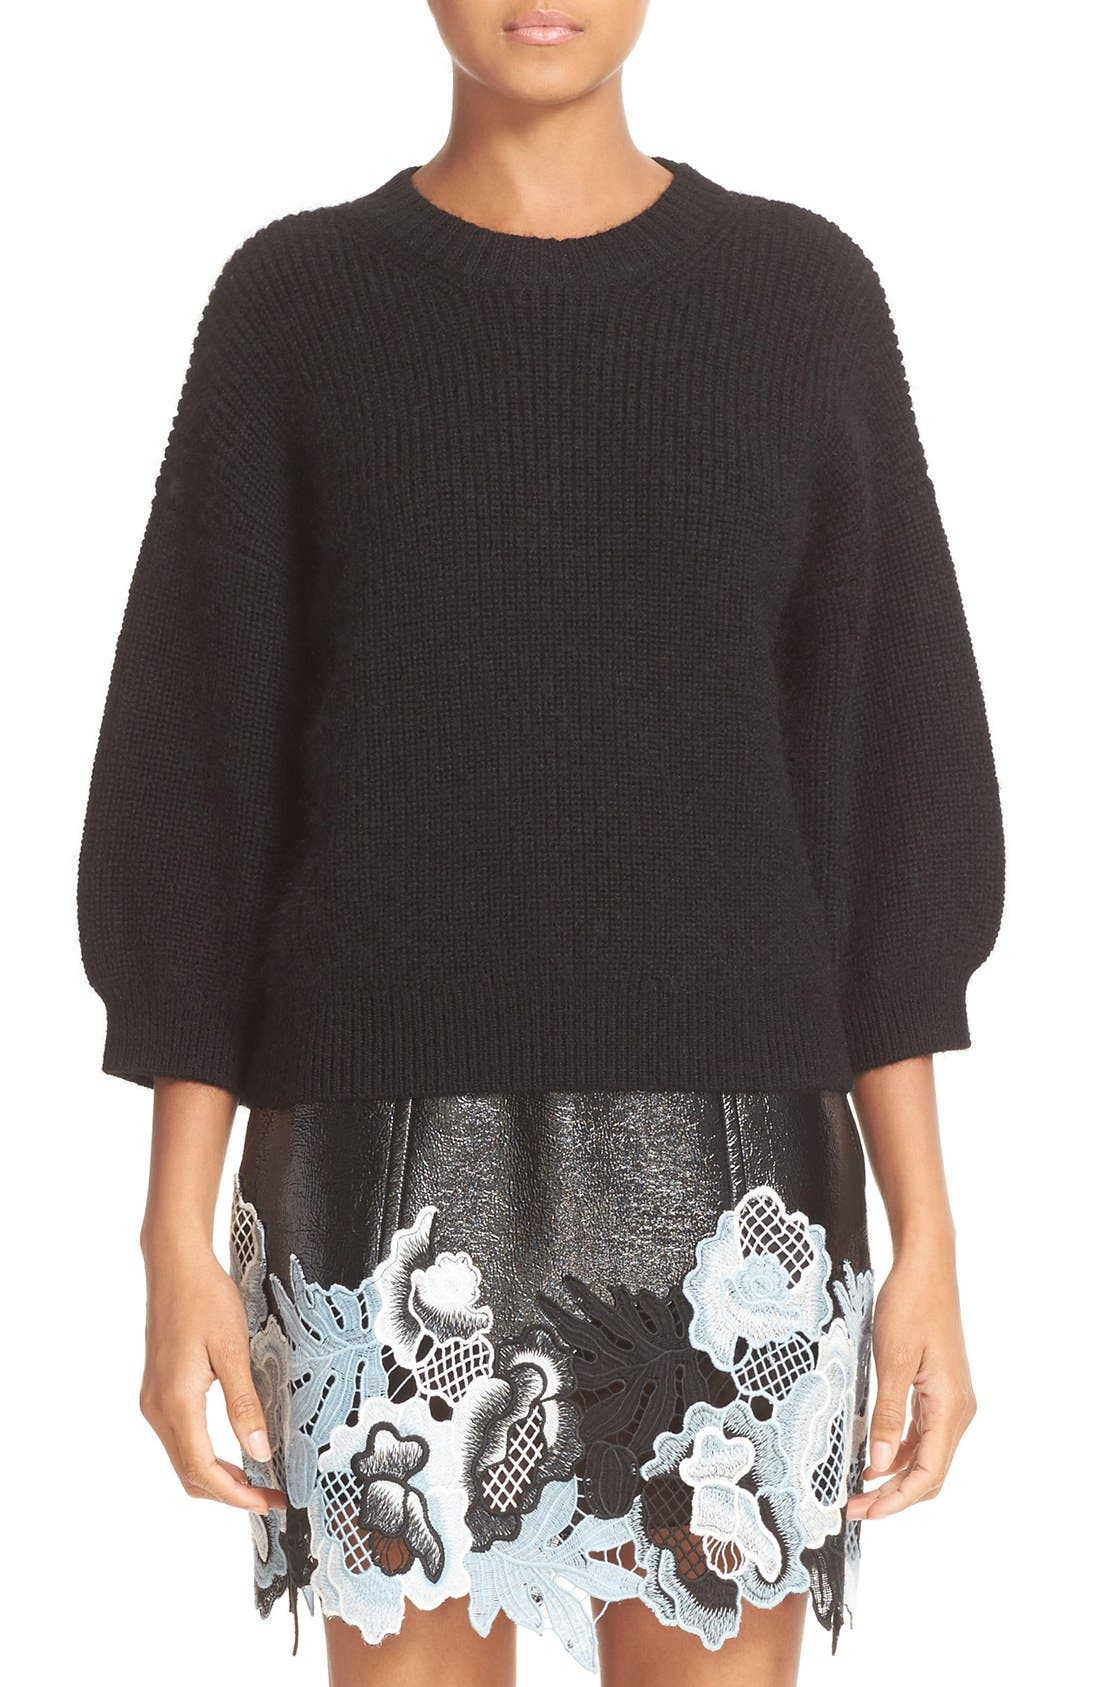 Main Image - 3.1 Phillip Lim Rib Knit Wool Blend Sweater